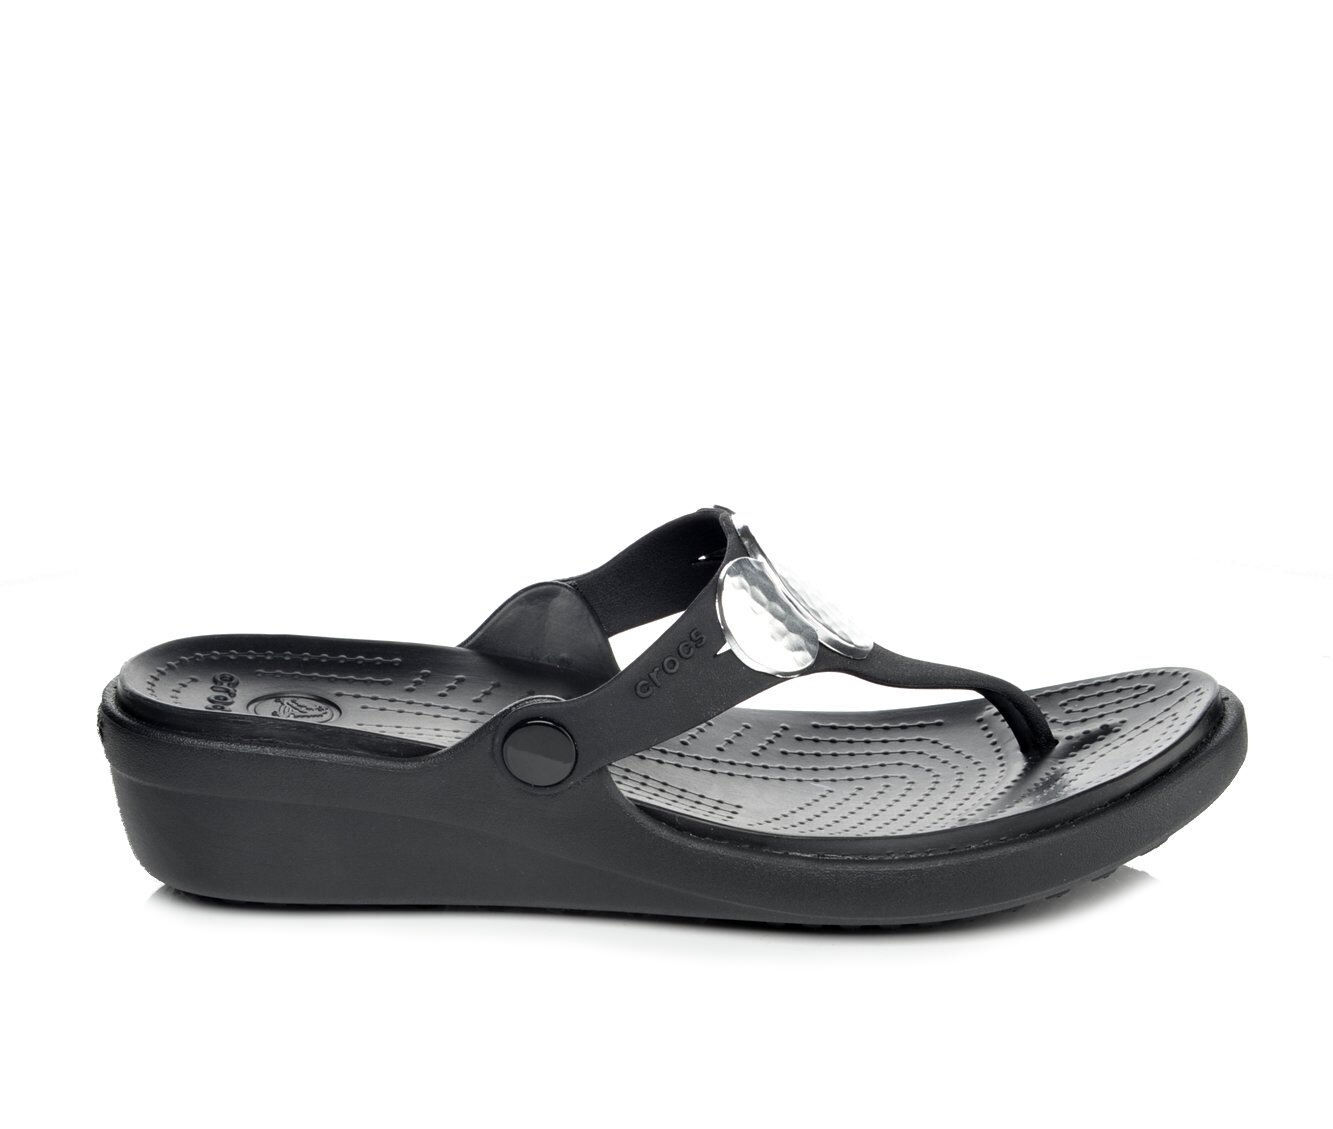 ad444e33f1f6 Womens crocs sanrah embellished wedge flip flops shoe carnival jpg  1694x1435 Cute croc flip fops